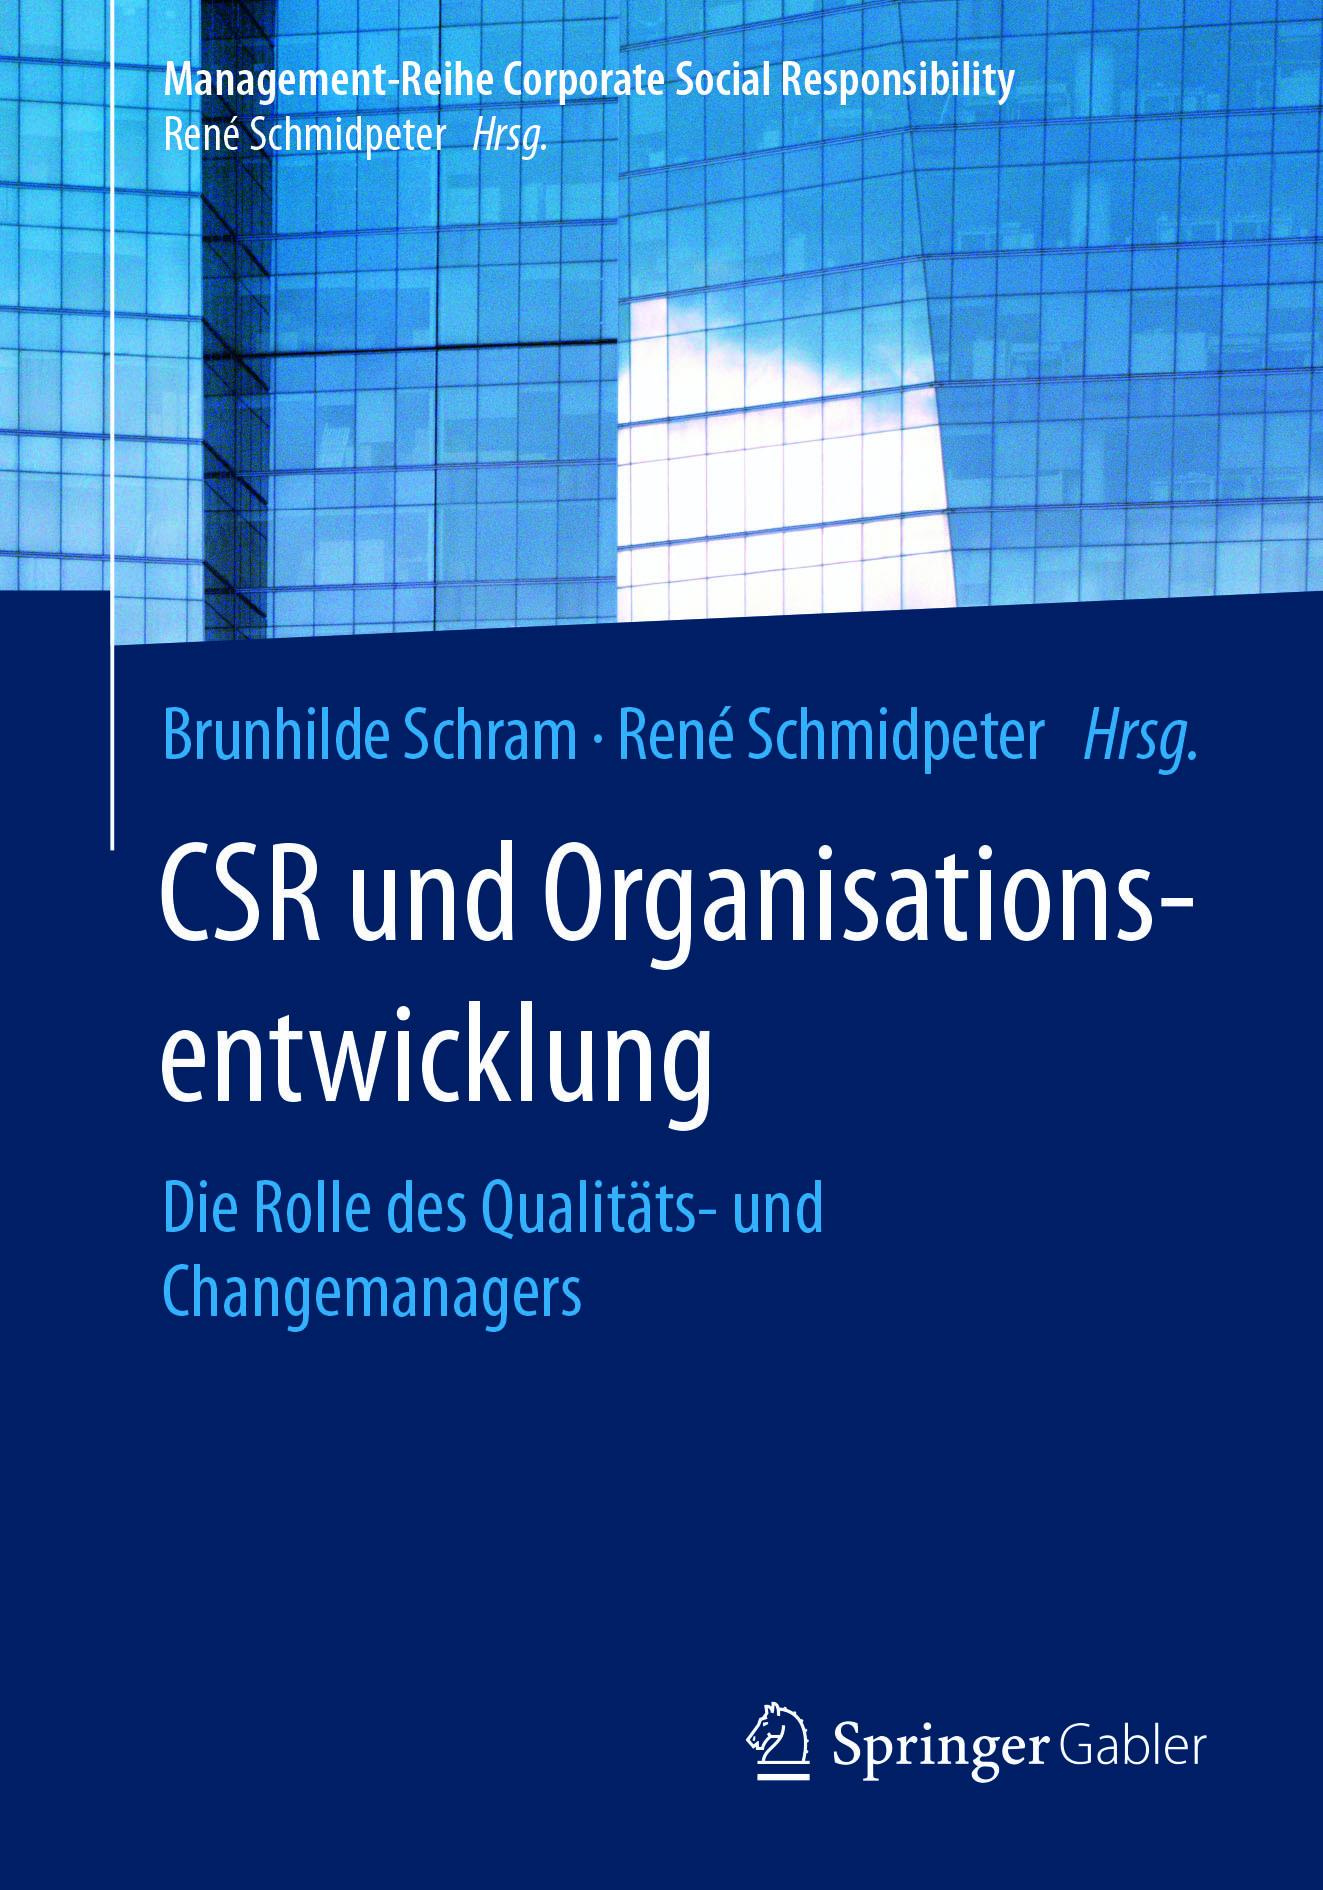 Schmidpeter, René - CSR und Organisationsentwicklung, ebook